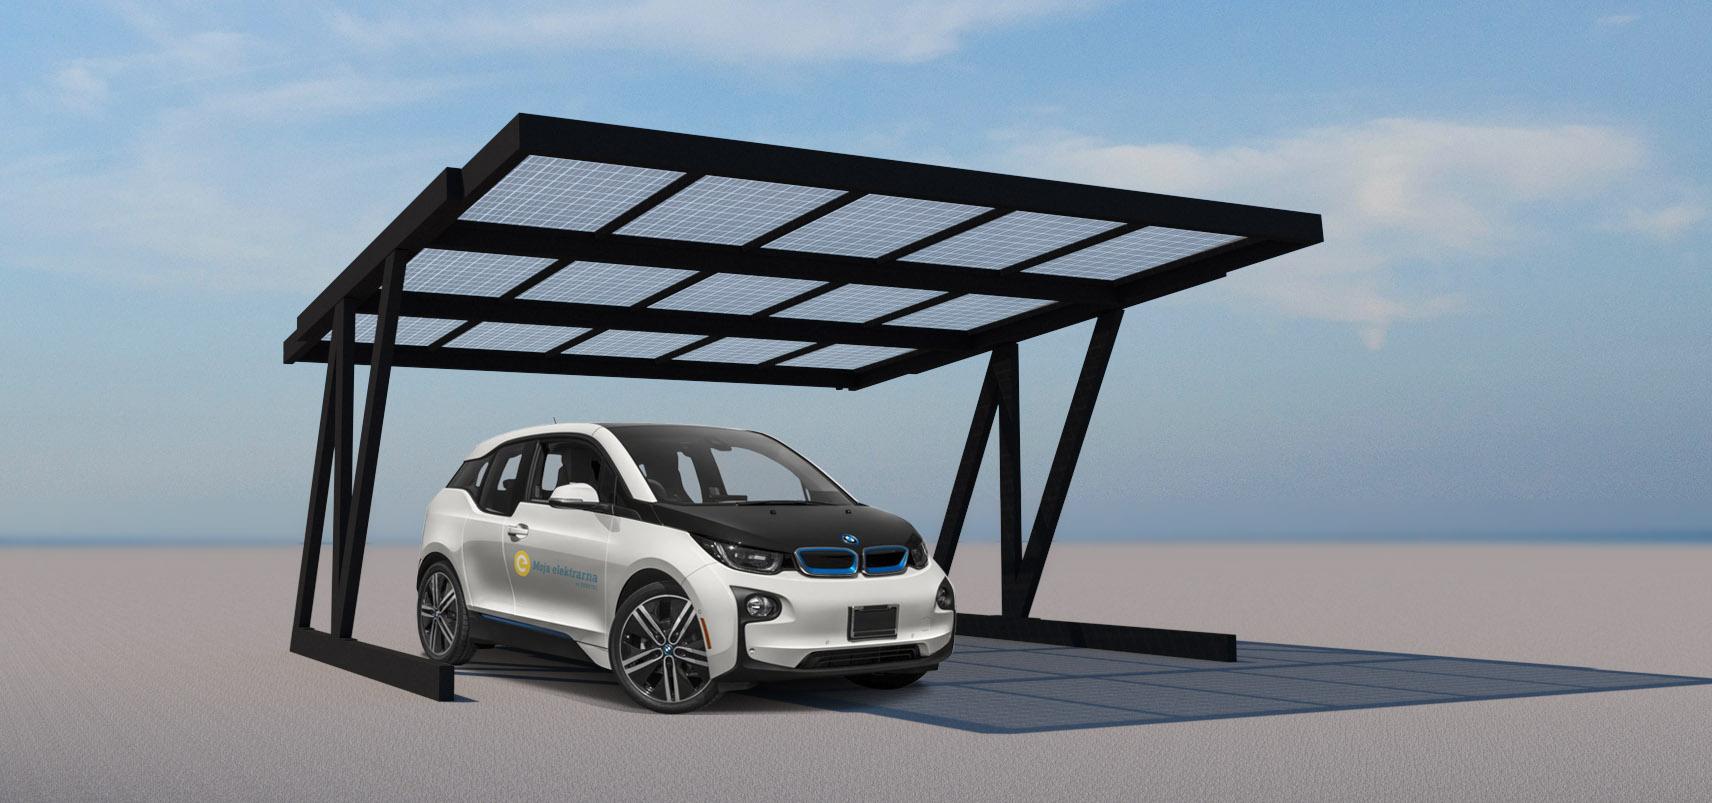 ePI Photovoltaik Carport